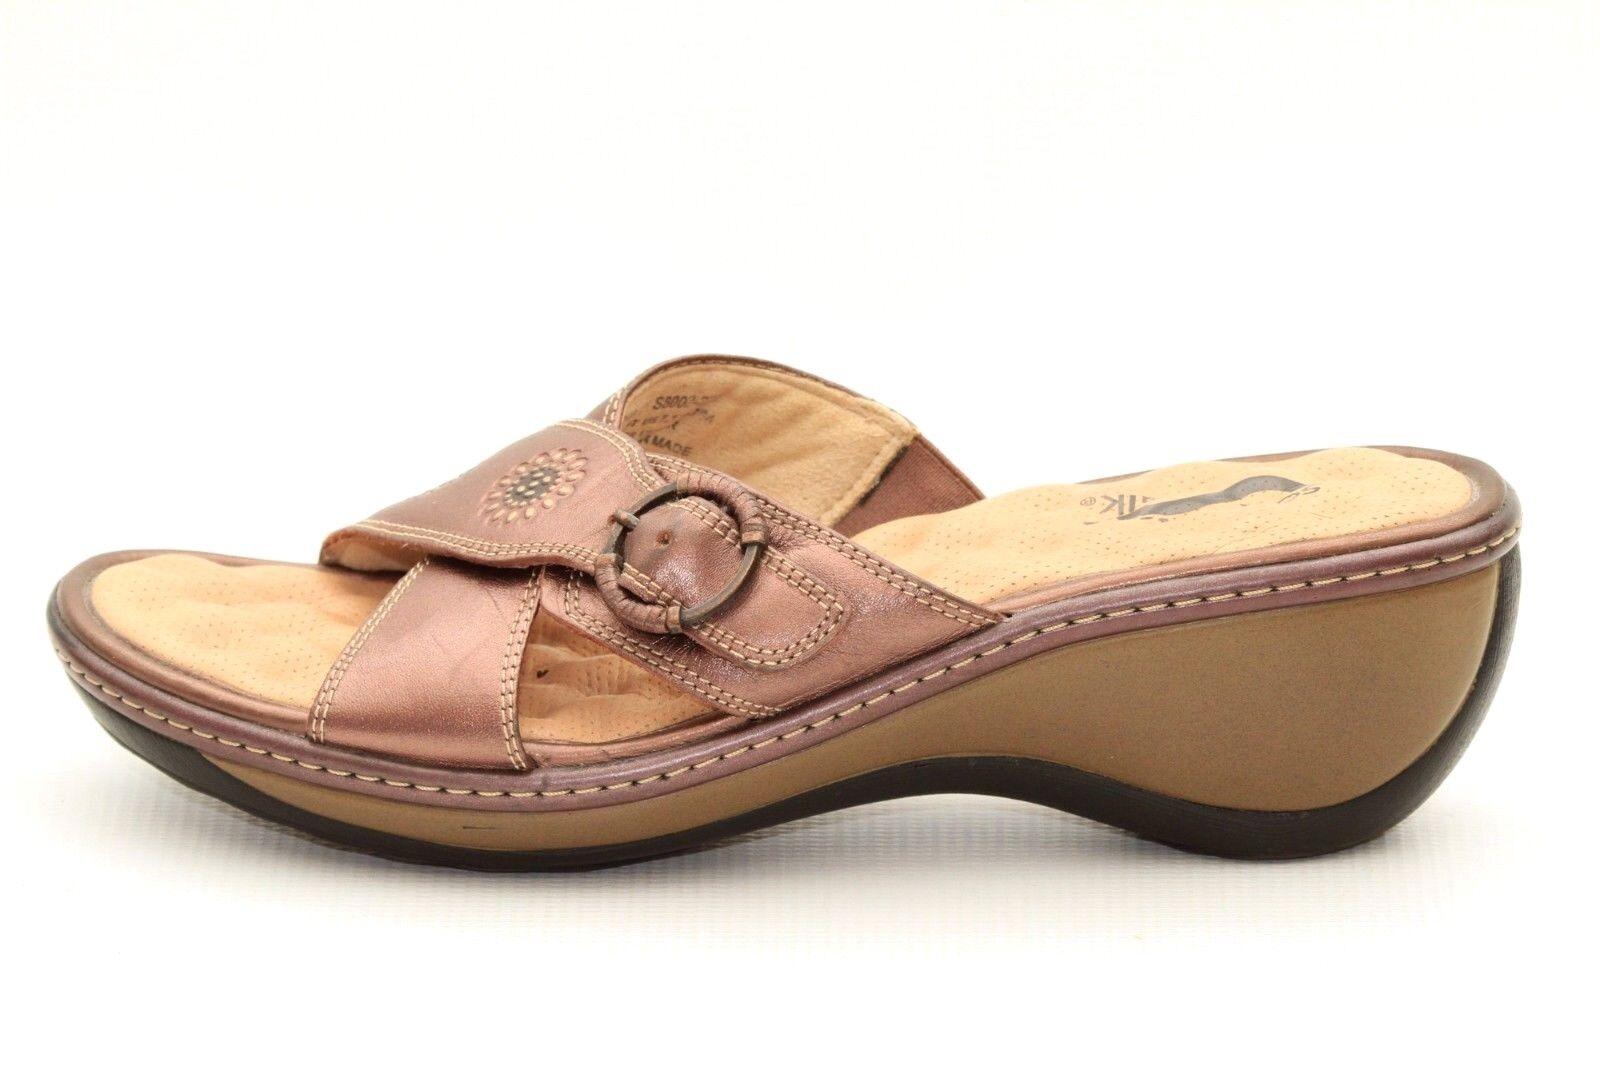 Yuu Alottie Womens Size 9 M Red Slingback Strap Sandals Ankle Strap q9p